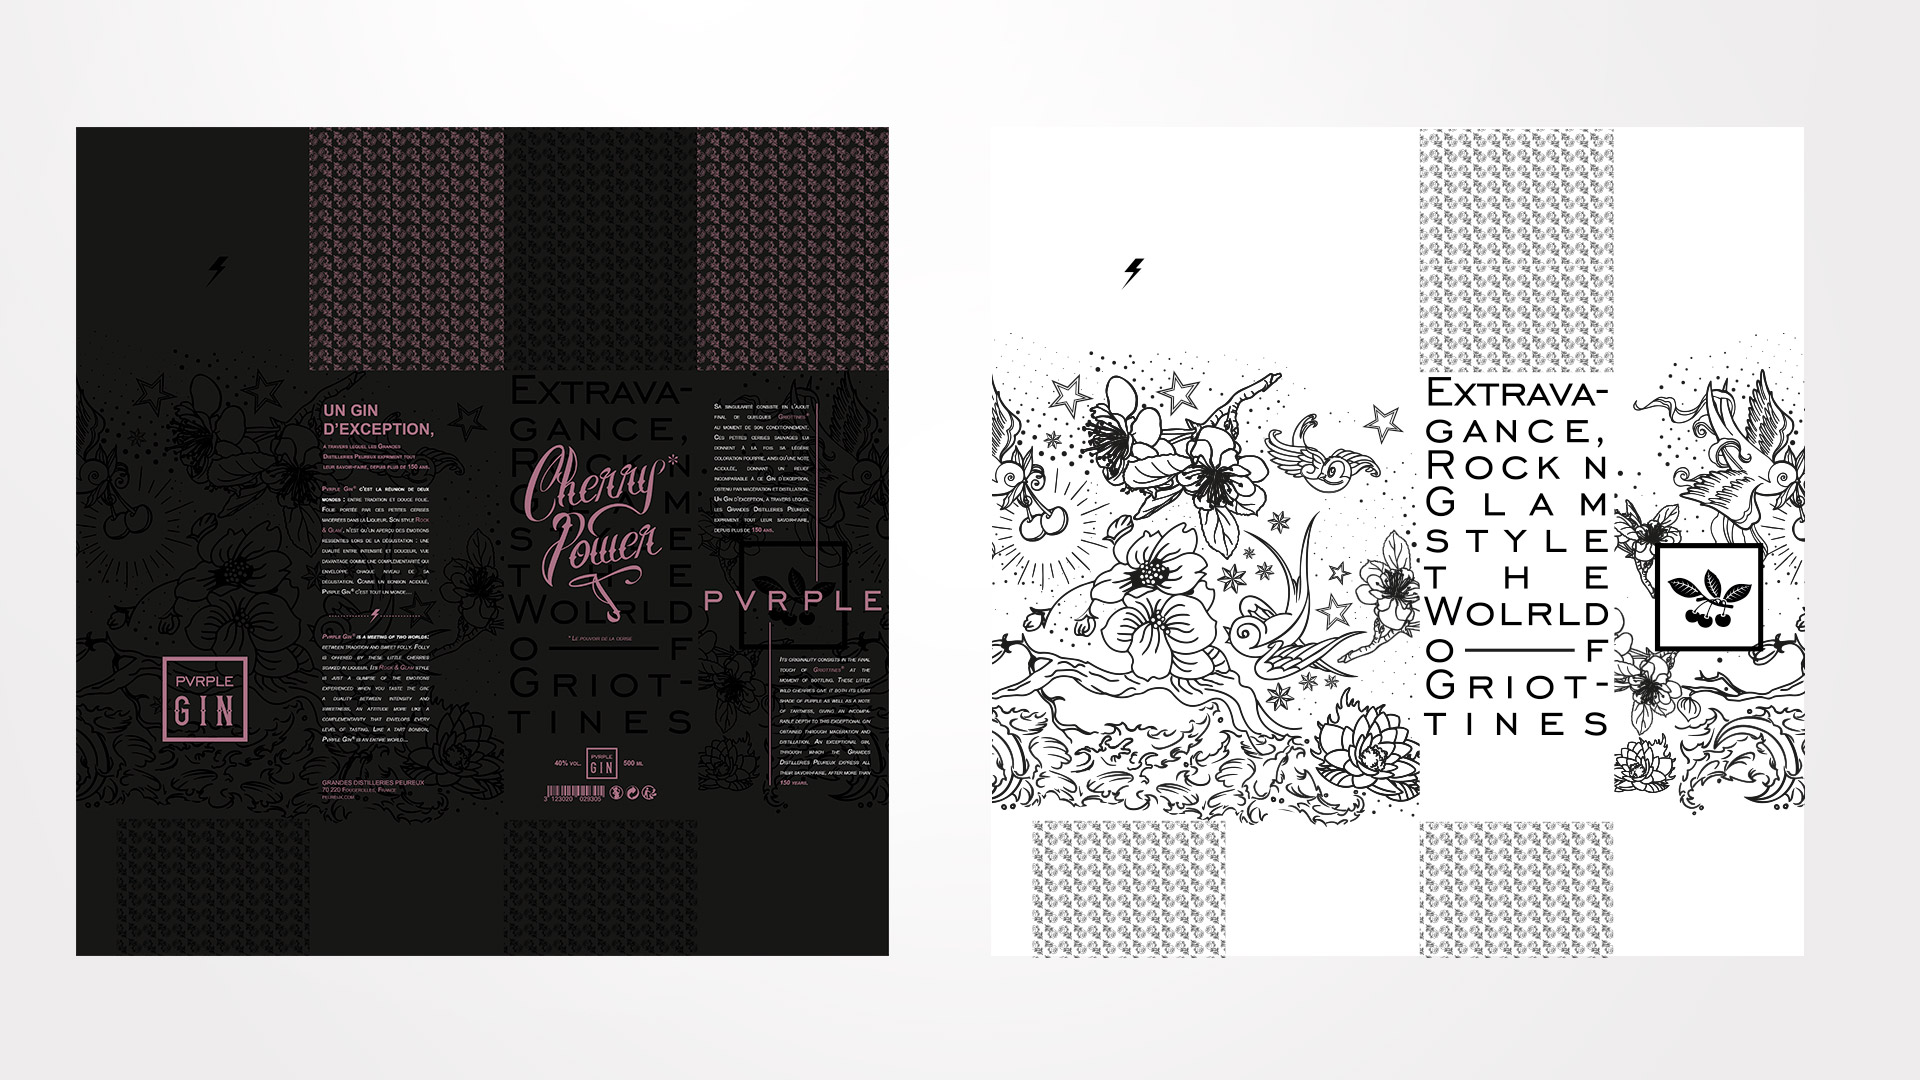 Gabarit Packaging design Pvrple Gin